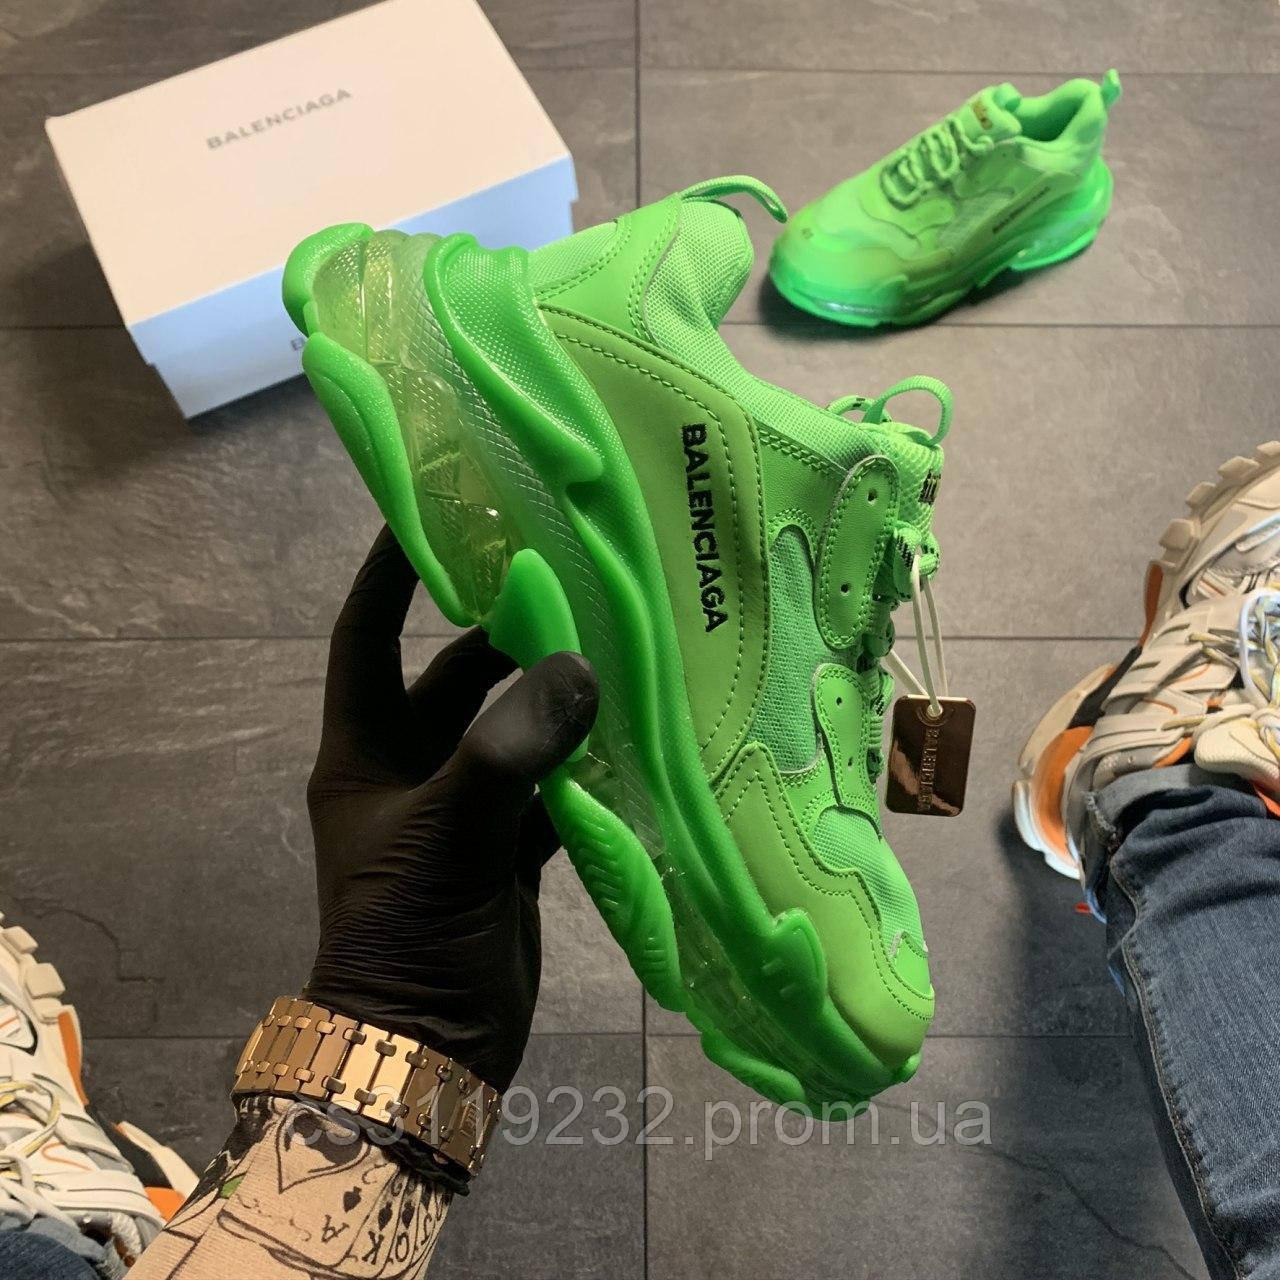 Мужские кроссовки Balenciaga Triple S Clear Sole Green Neon (зелёные)